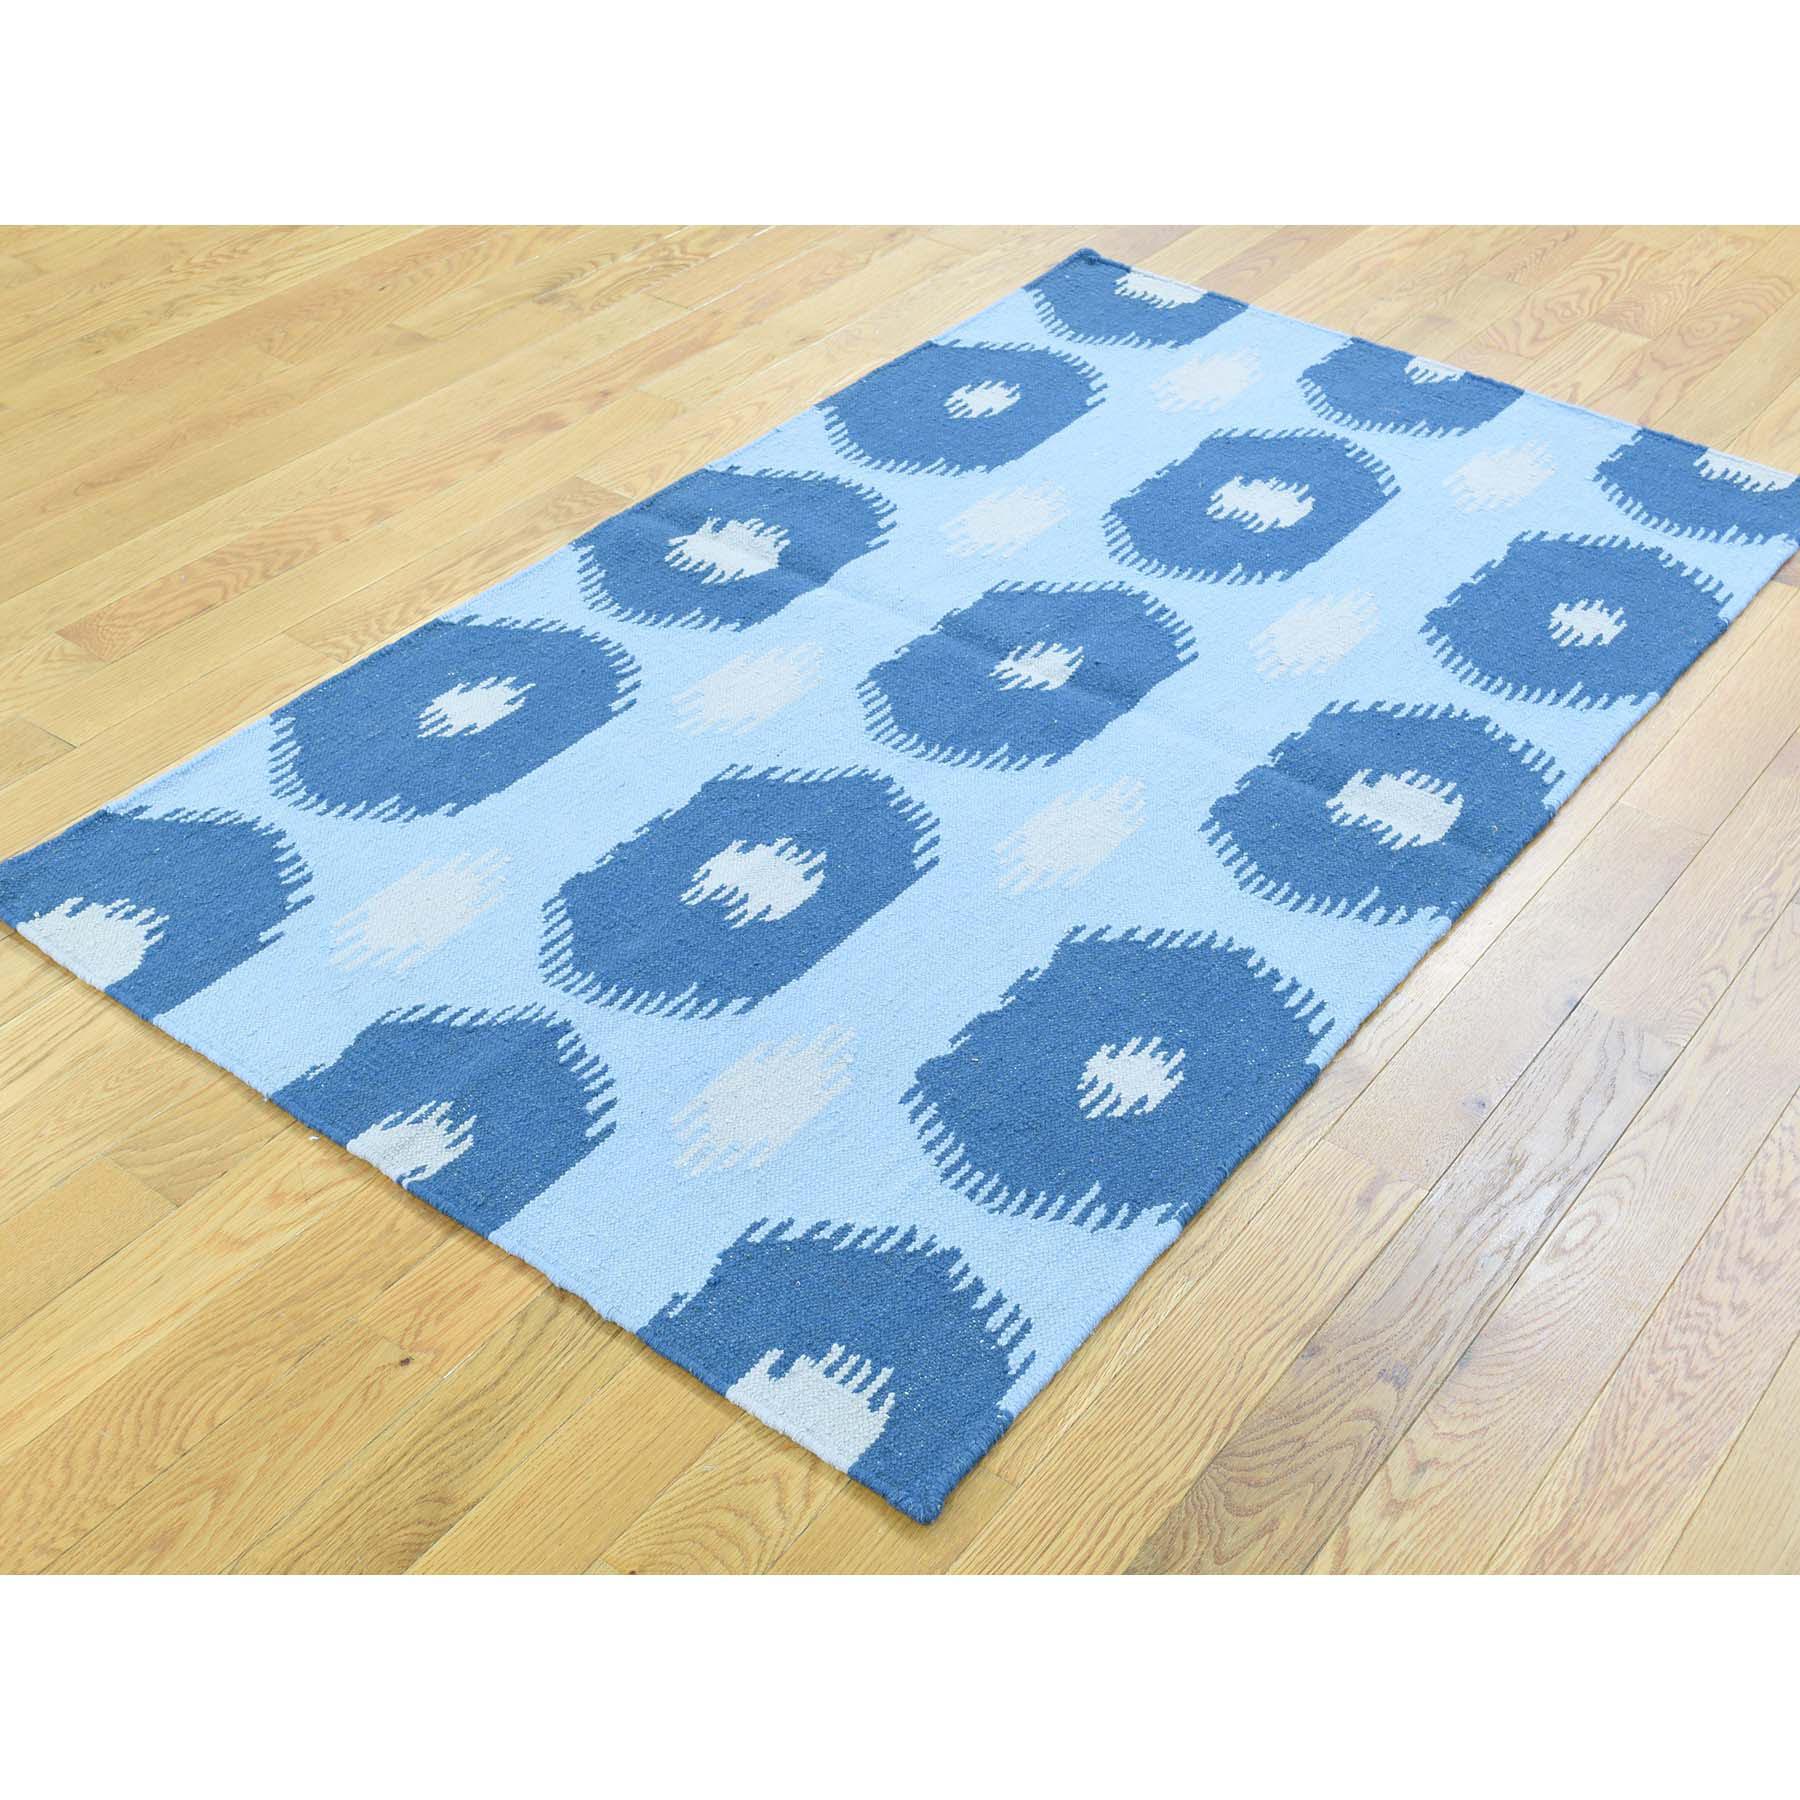 3-1 x5-2  Reversible Kilim Flat Weave Hand-Woven Pure Wool Oriental Rug